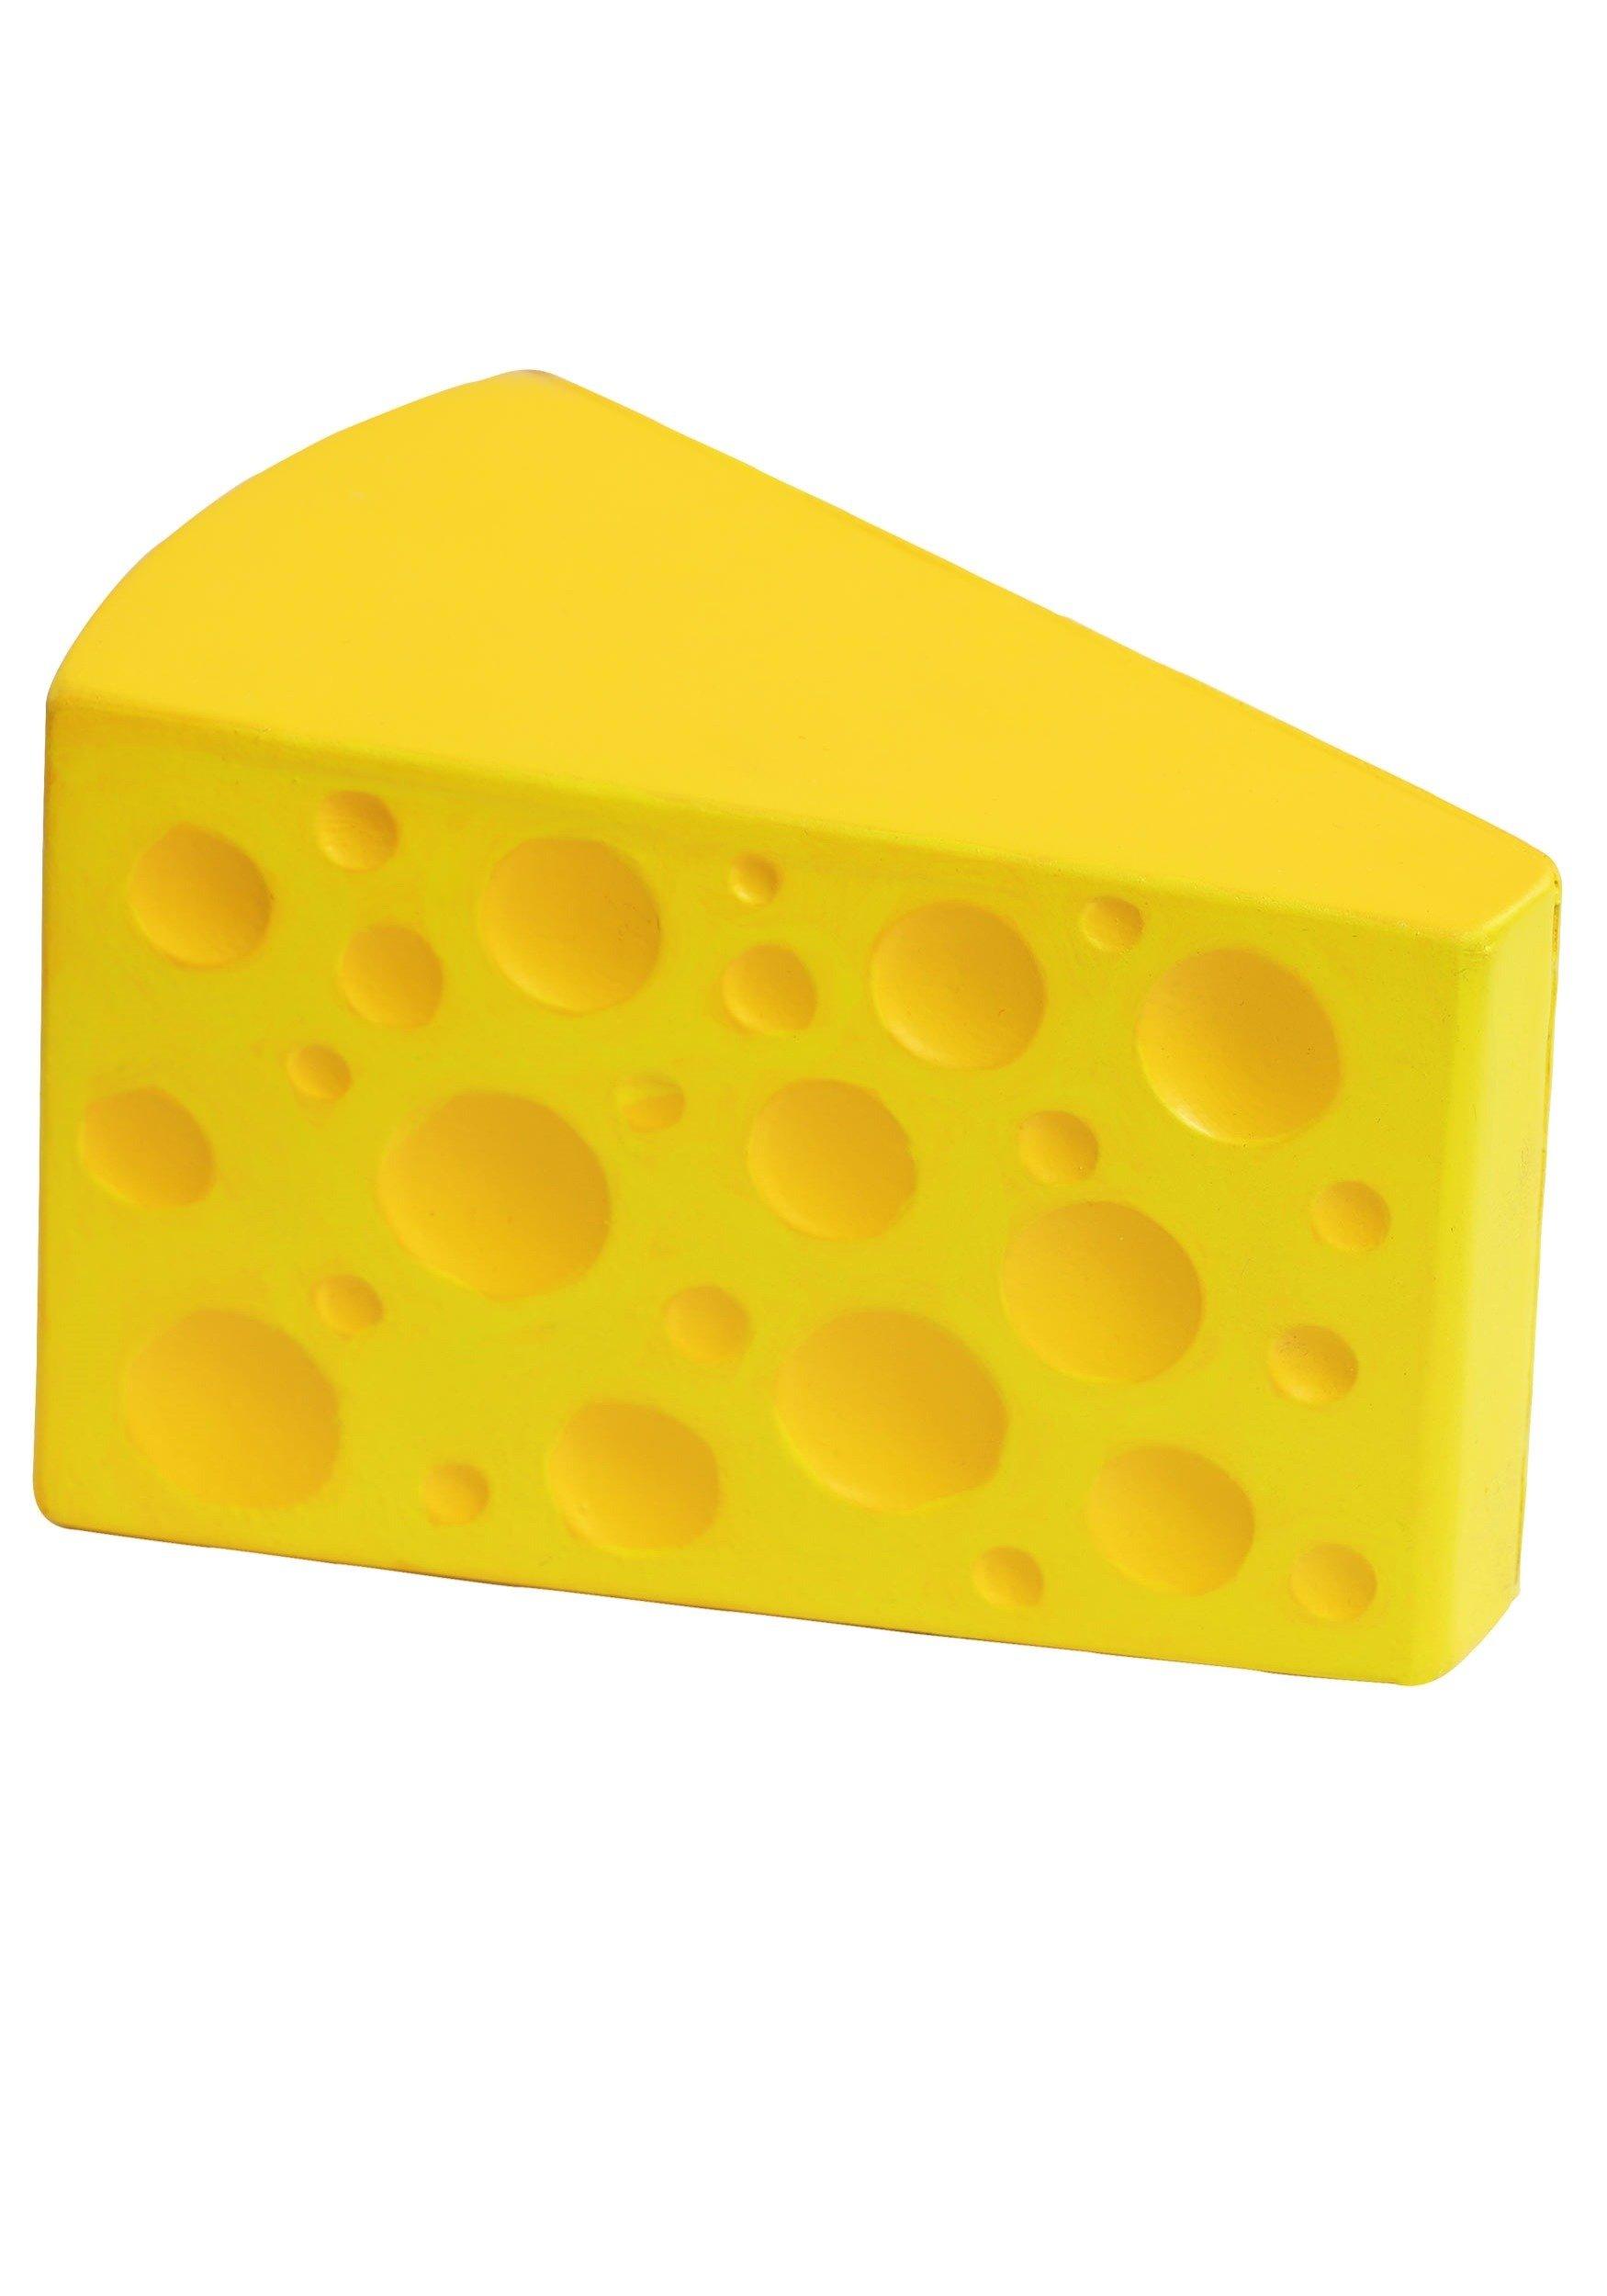 Fun Costumes Foam Block of Cheese Standard